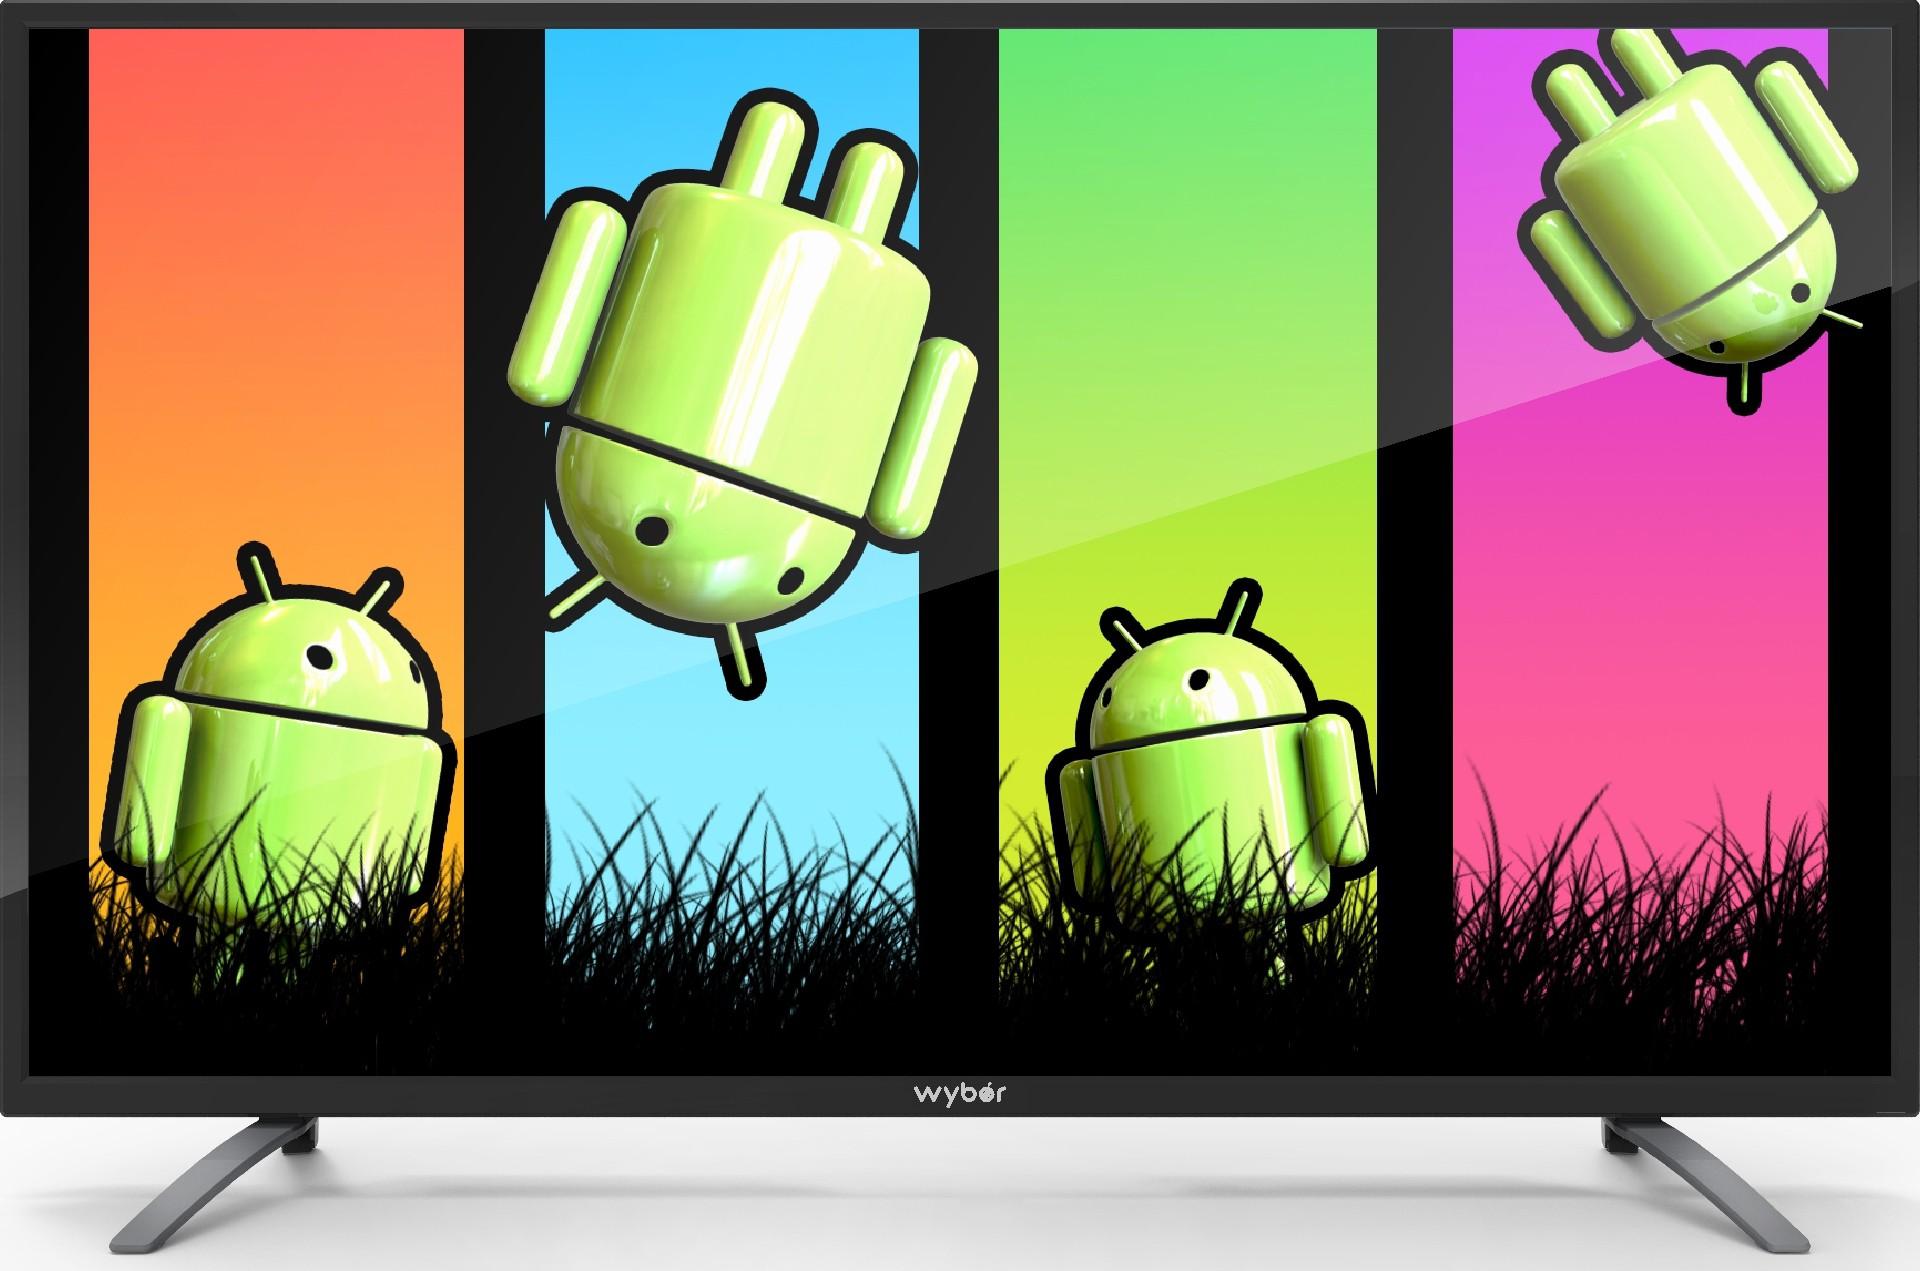 WYBOR 50MS16 48 Inches Full HD LED TV